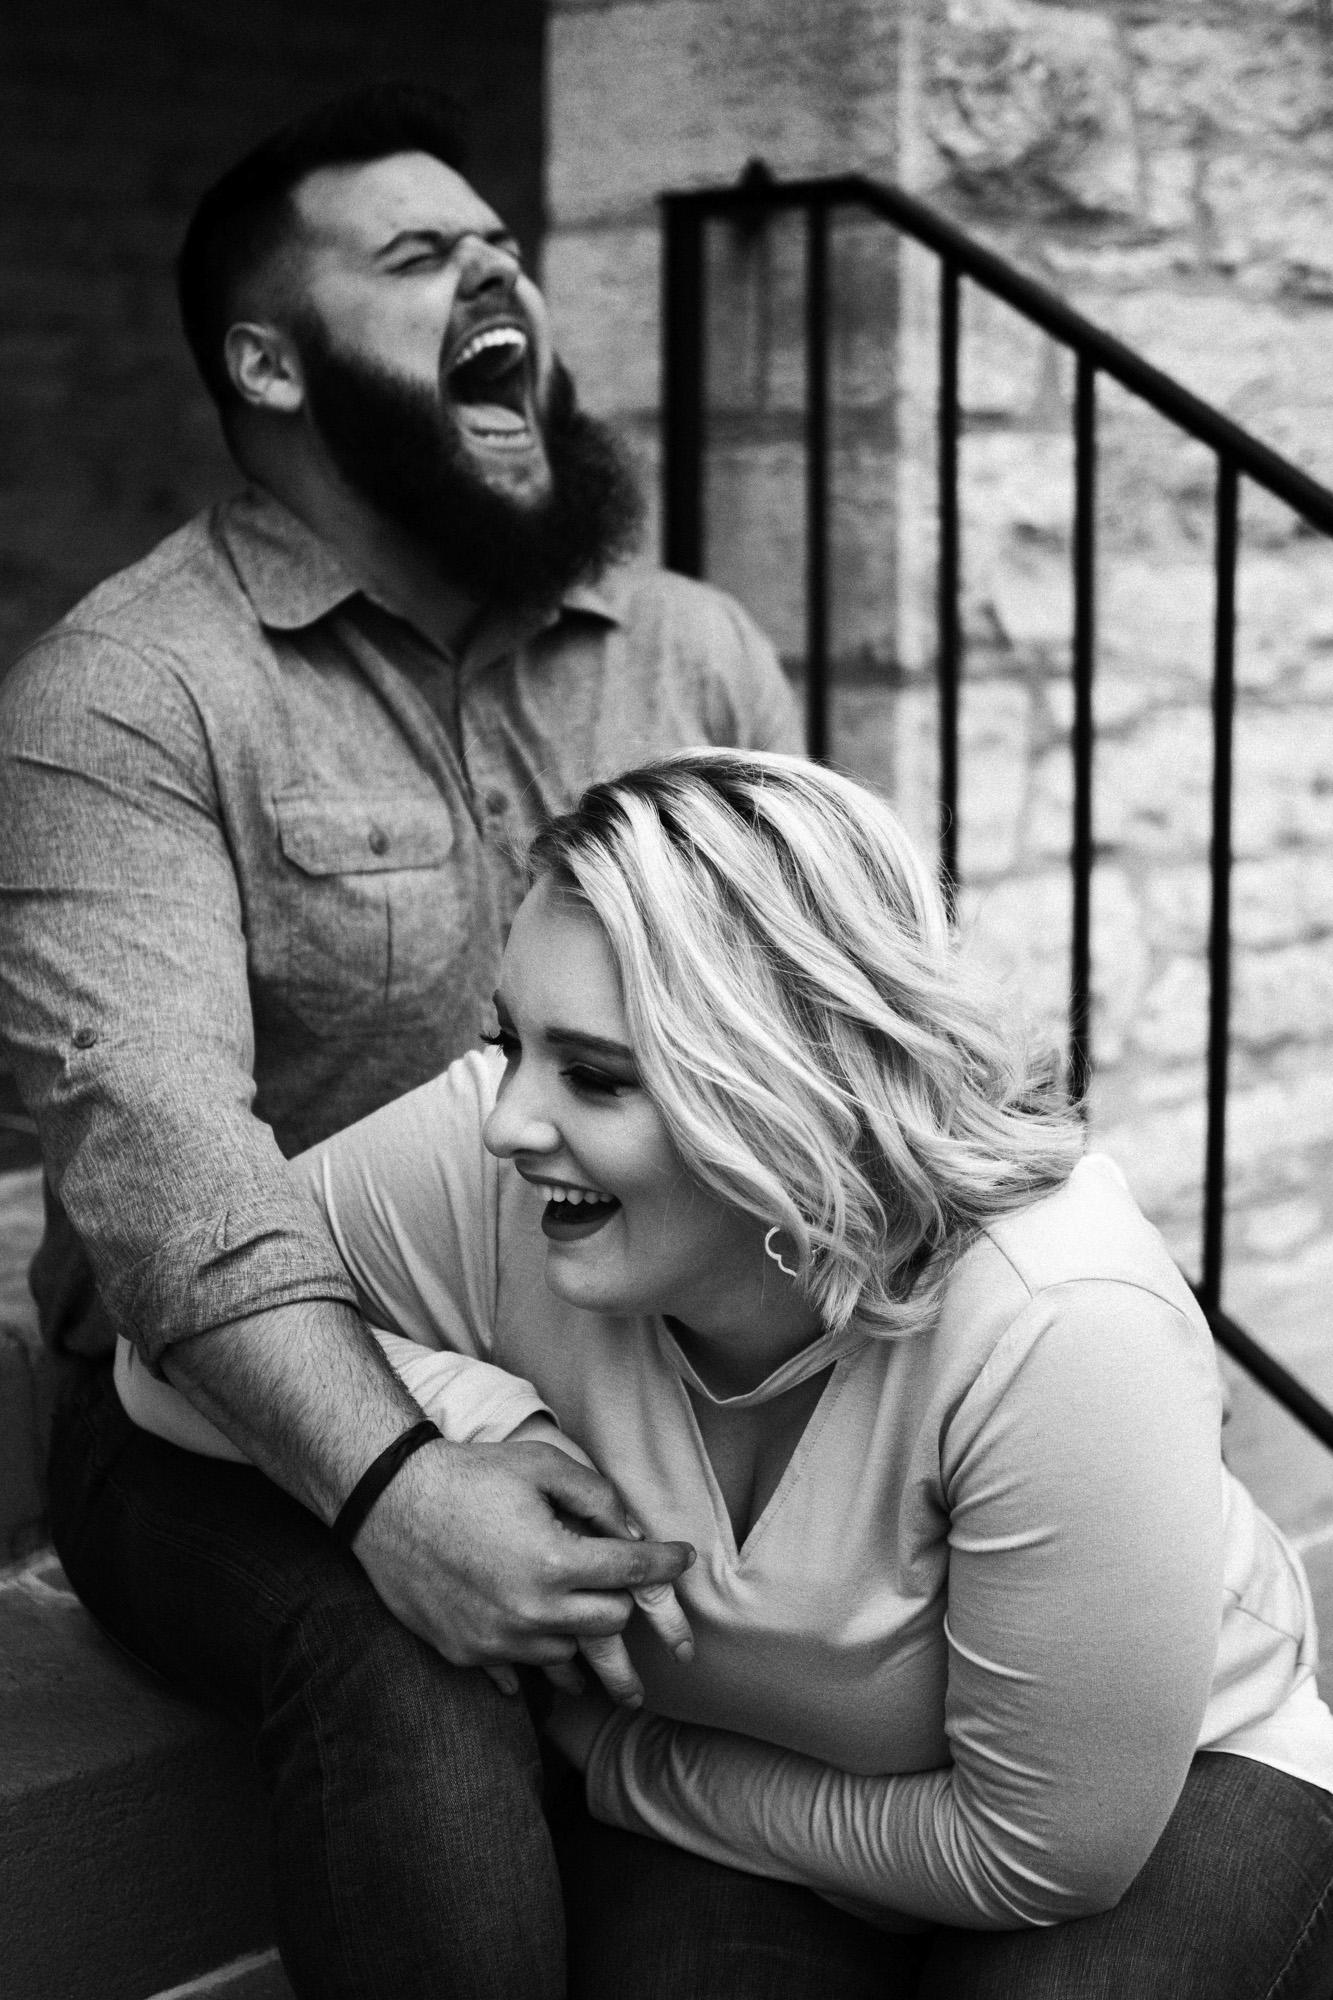 Cate_Ann_Photography_Dayton_Ohio_Wedding_And_Engagement_PhotographerDSC_2774.jpg